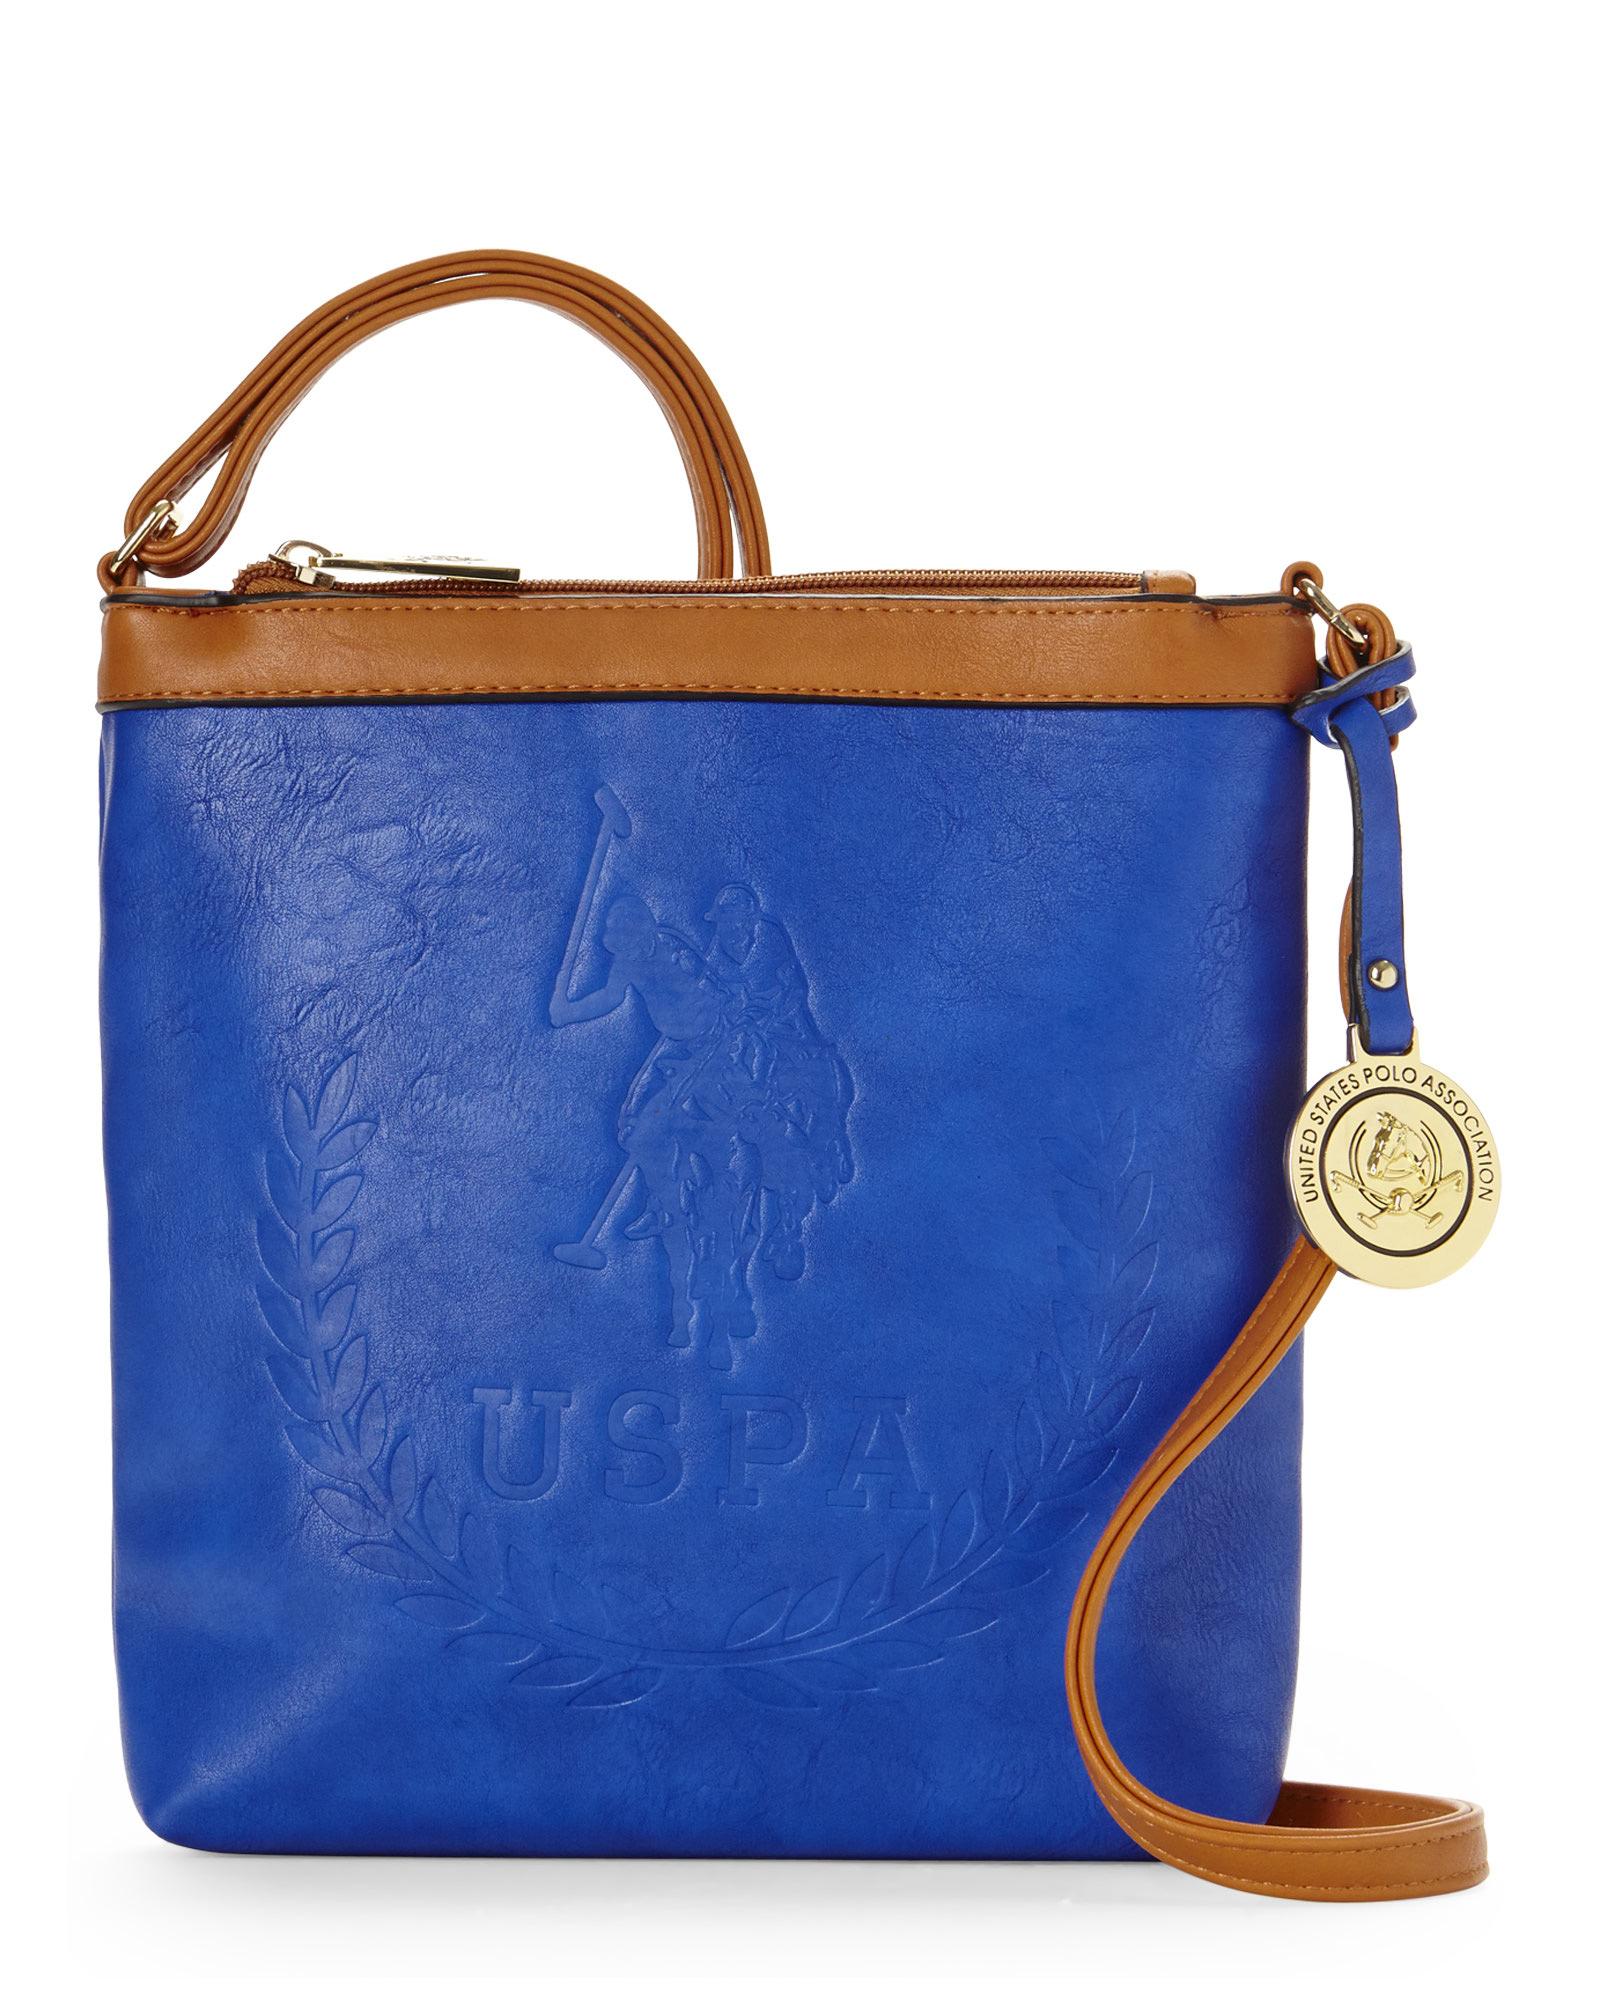 93b5d20b6502 Lyst - U.S. POLO ASSN. Cobalt   Cognac Embossed Billy Crossbody in Blue